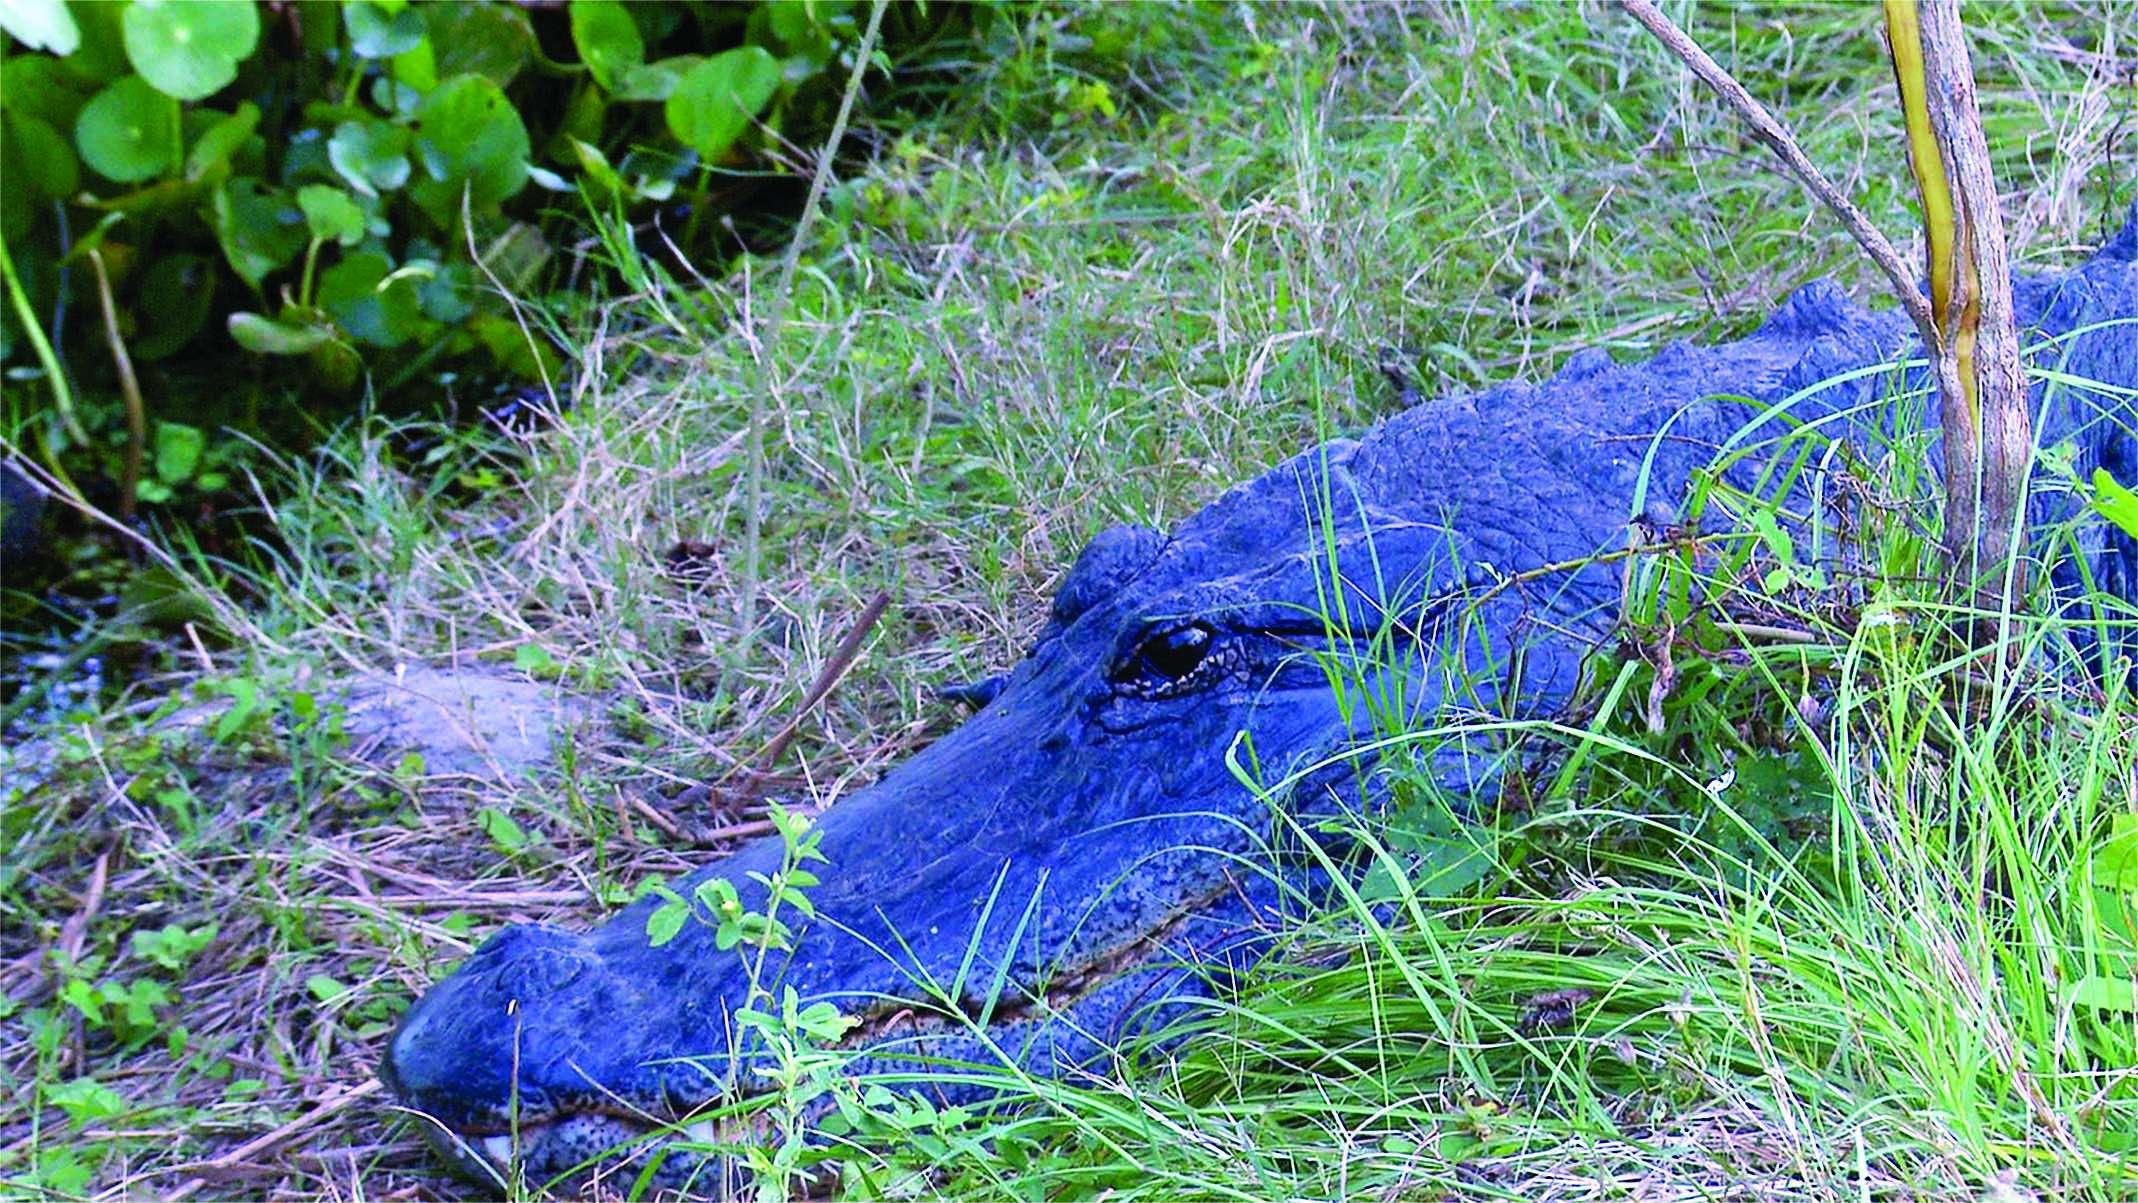 Paynes Prairie Preserve State Park in Gainesville, Florida